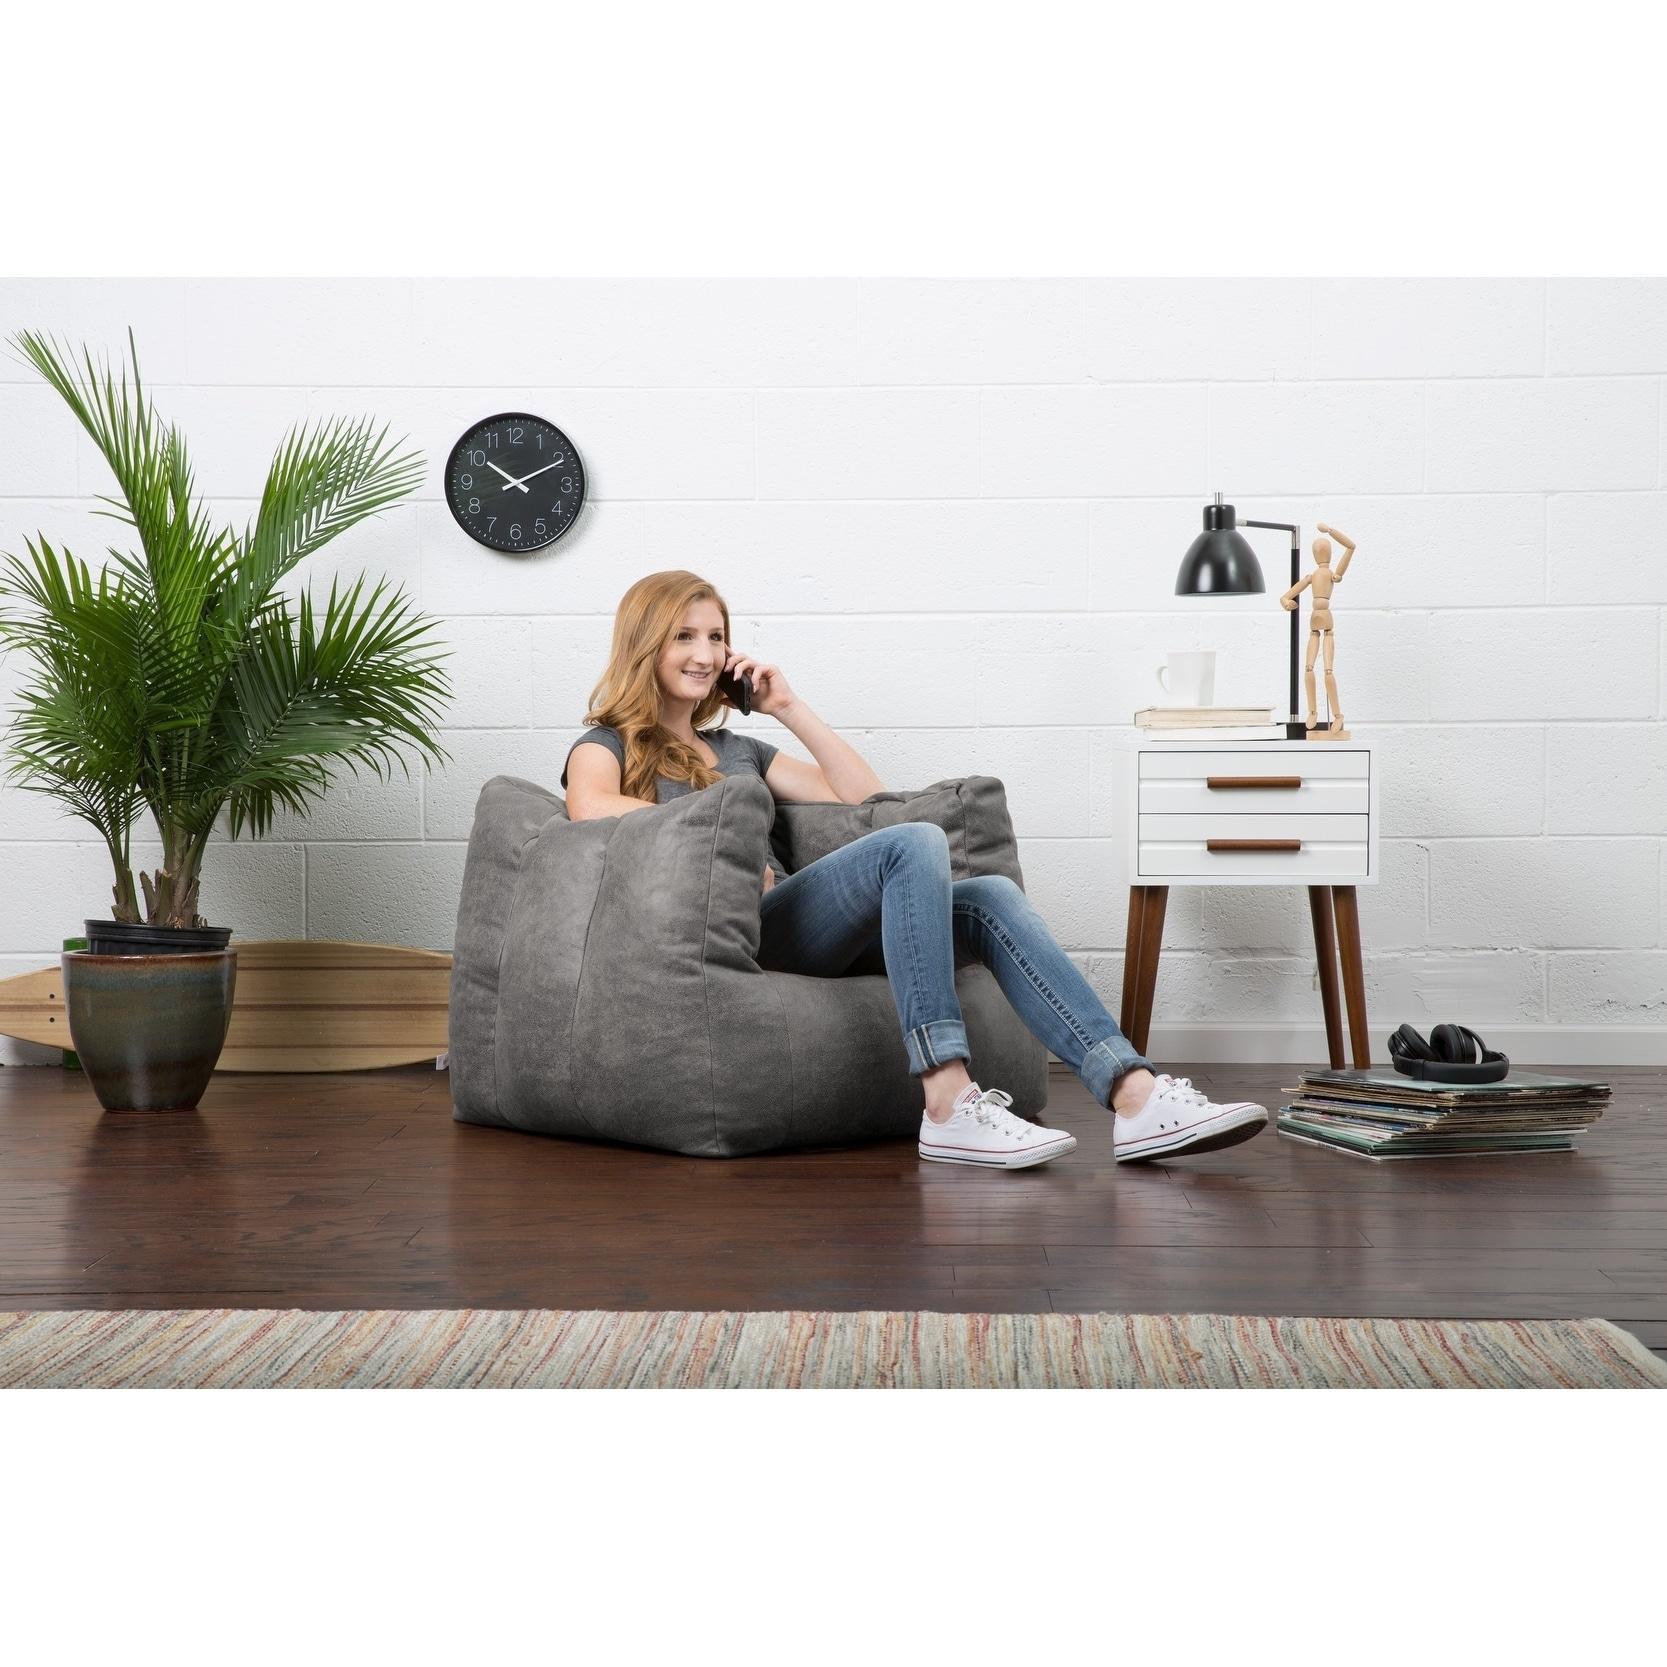 Super Big Joe Lux Cube Bean Bag Chair Multiple Colors Unemploymentrelief Wooden Chair Designs For Living Room Unemploymentrelieforg